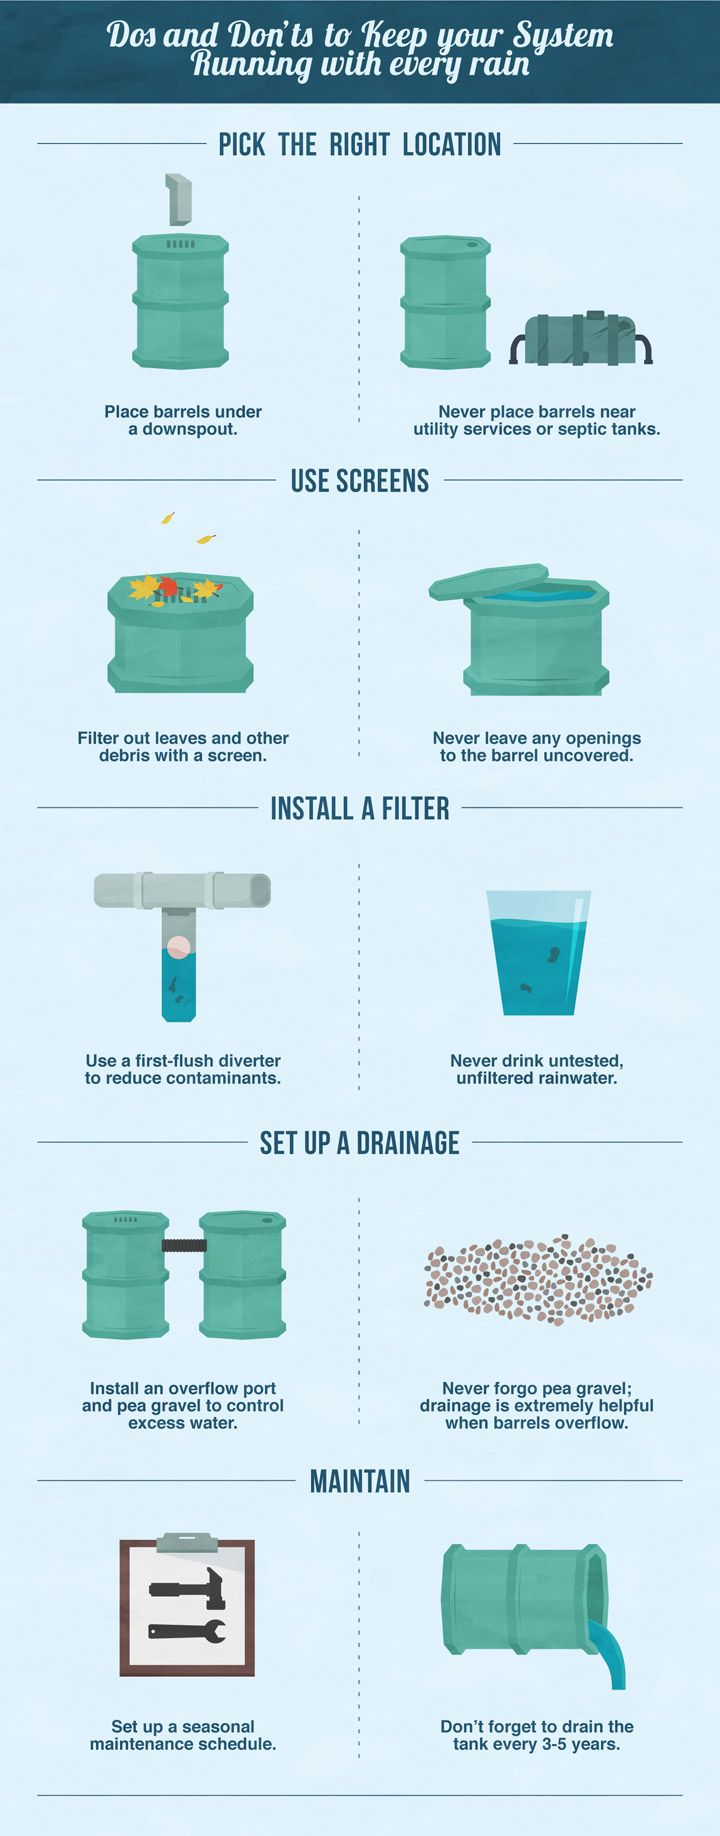 Why Everyone Should Care About Rainwater Harvesting #rain #rainharvesting